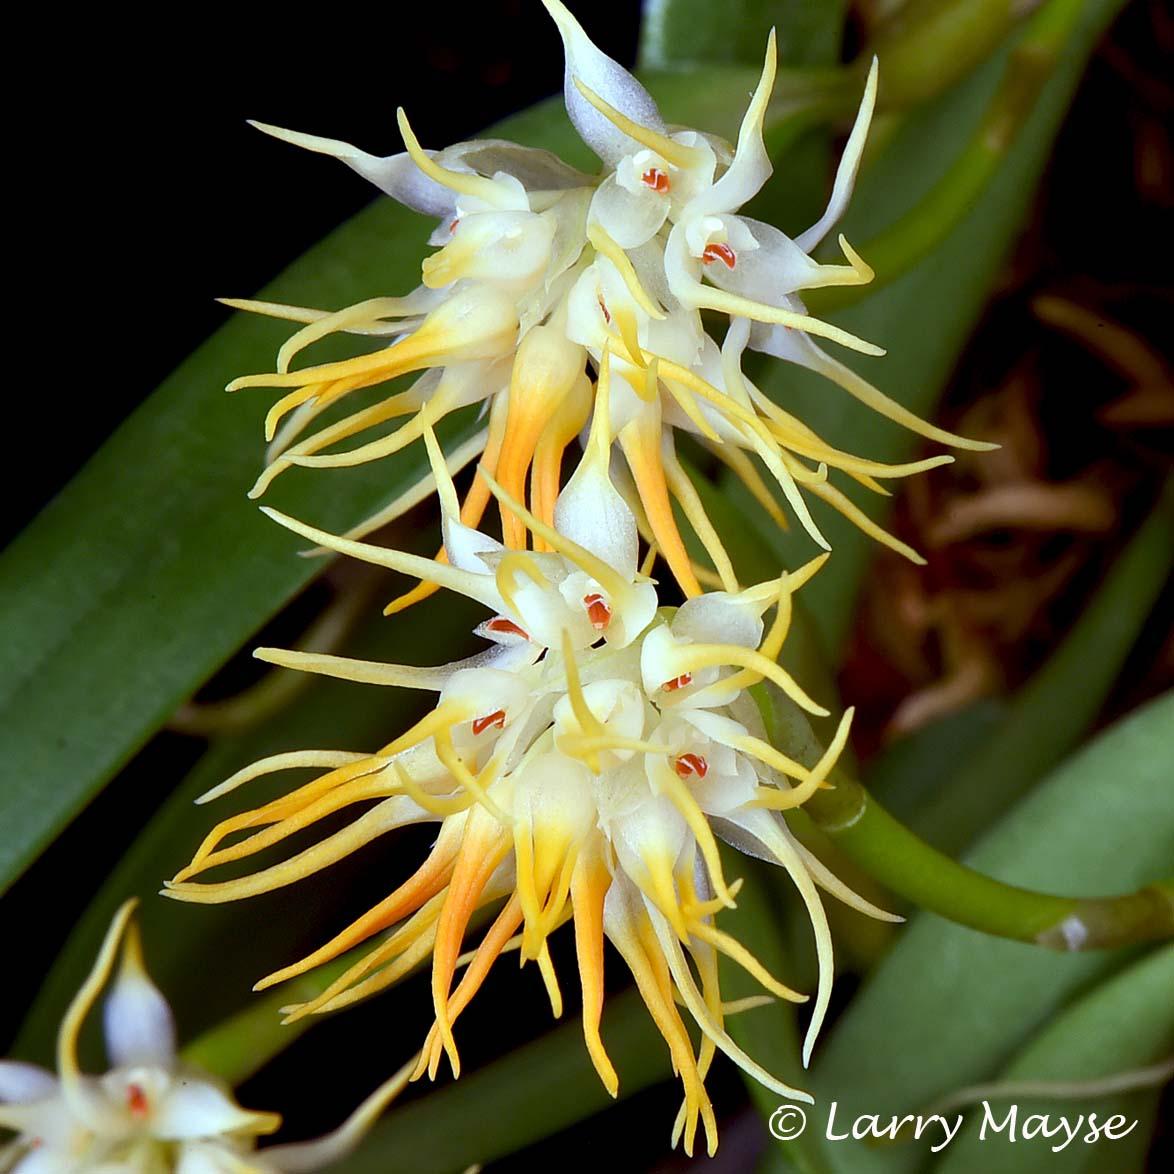 Bulbophyllum odoratissimum var